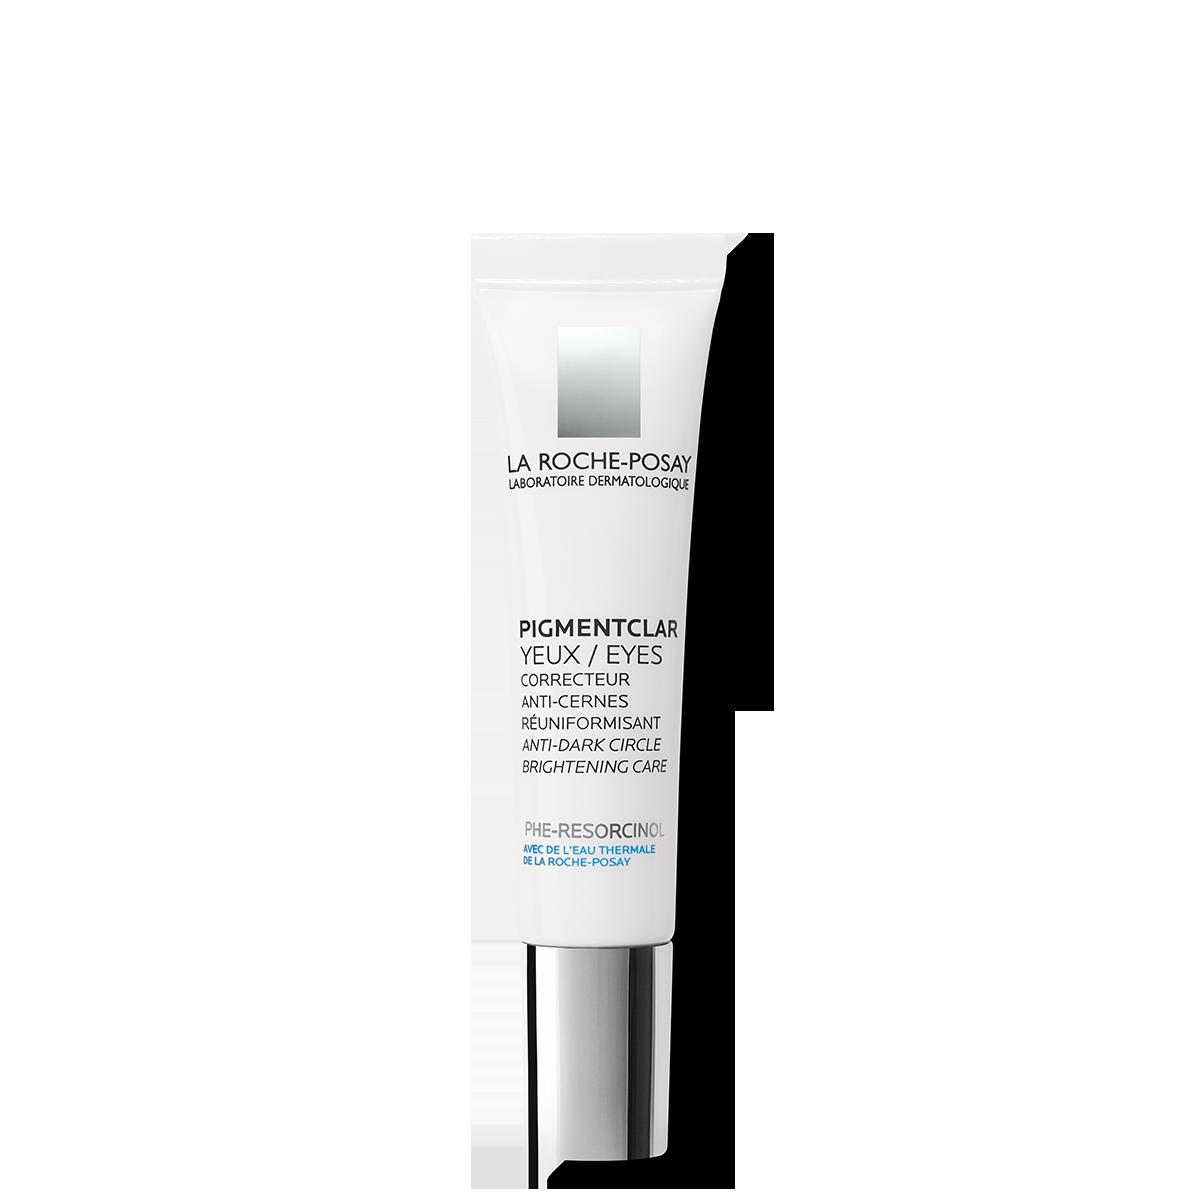 Pigmentclar Eye Cream Anti Dark Circle 15ml Brightening Care